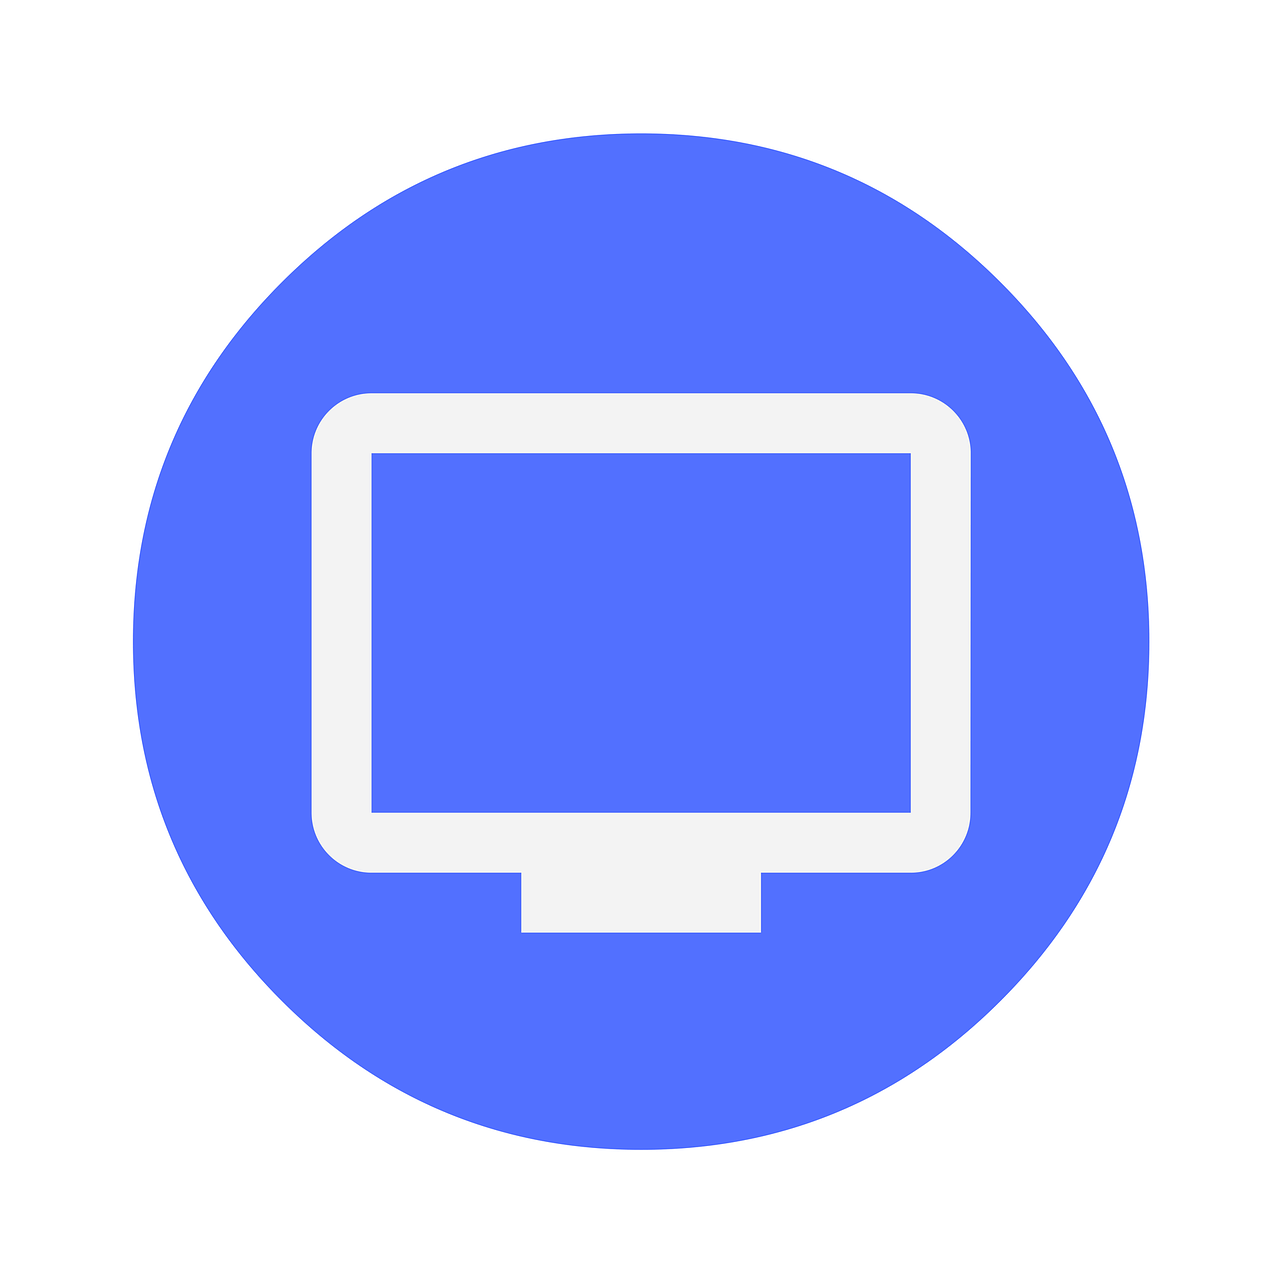 icon, monitor, desktop